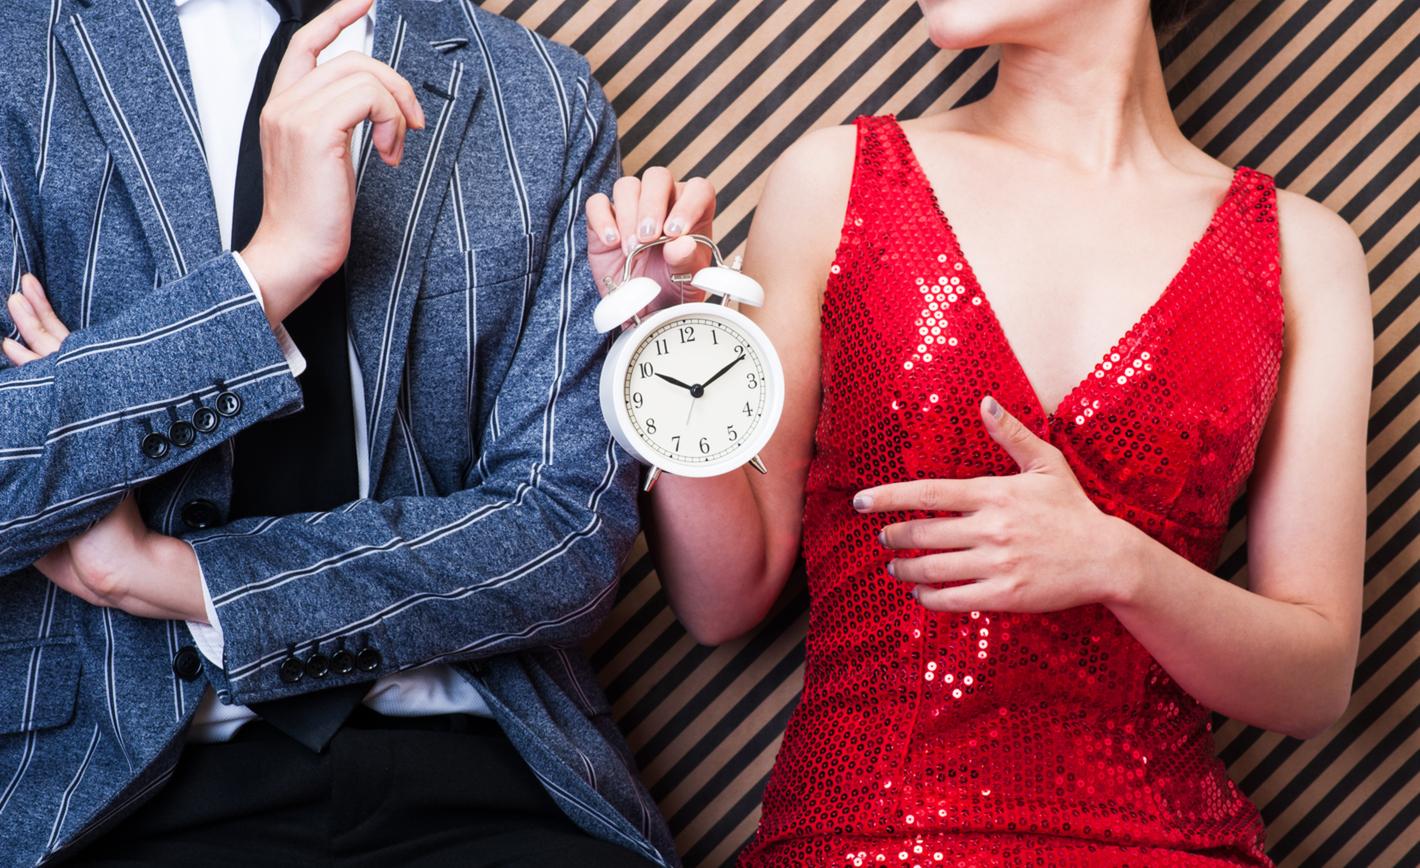 Online dating sucks but thats how i met my wife